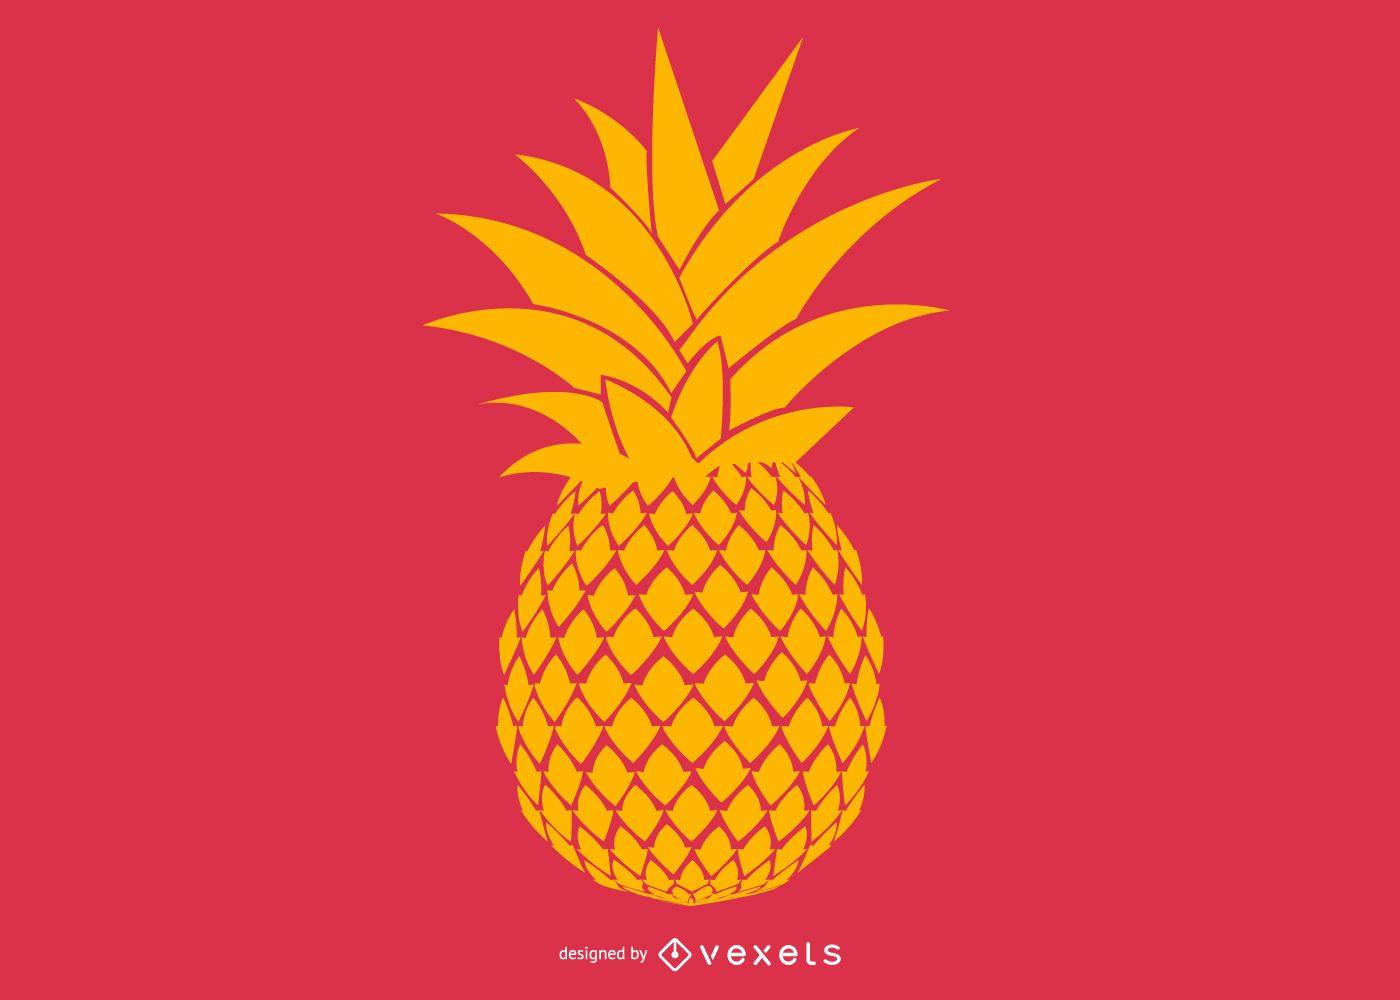 Pineapple illustration design